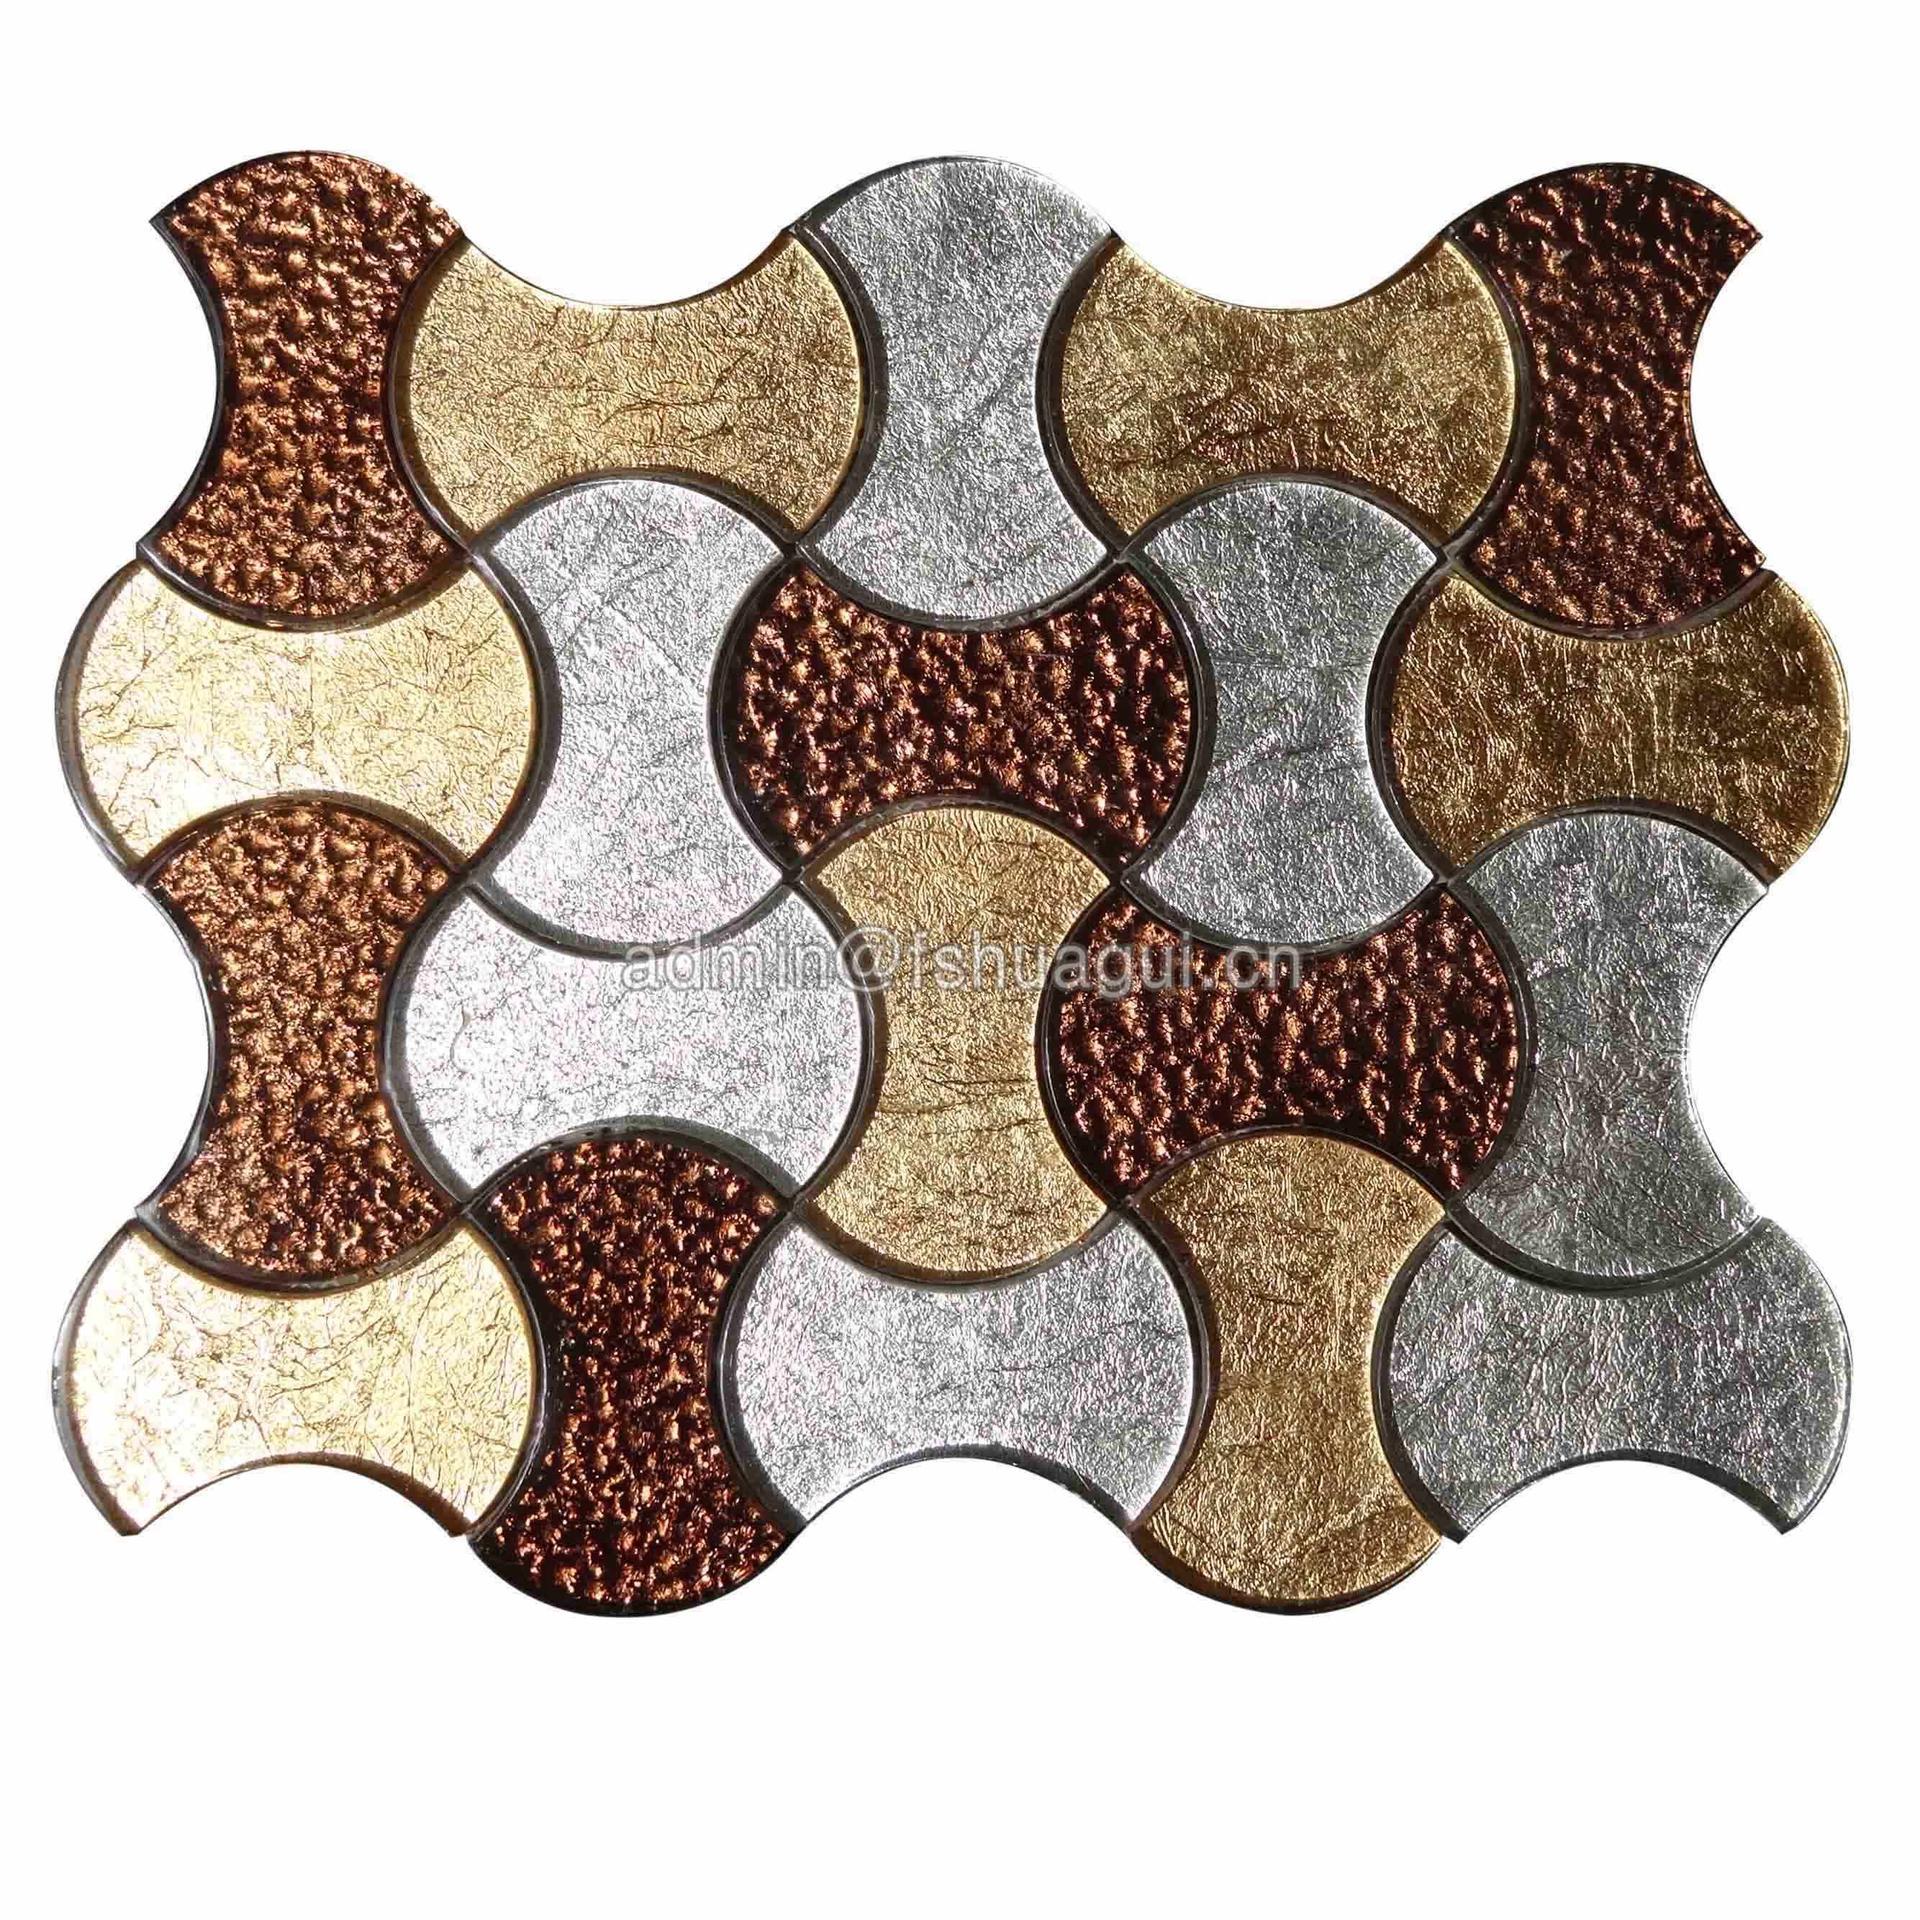 Stylish ornate glass mosaic kitchen backsplash tile